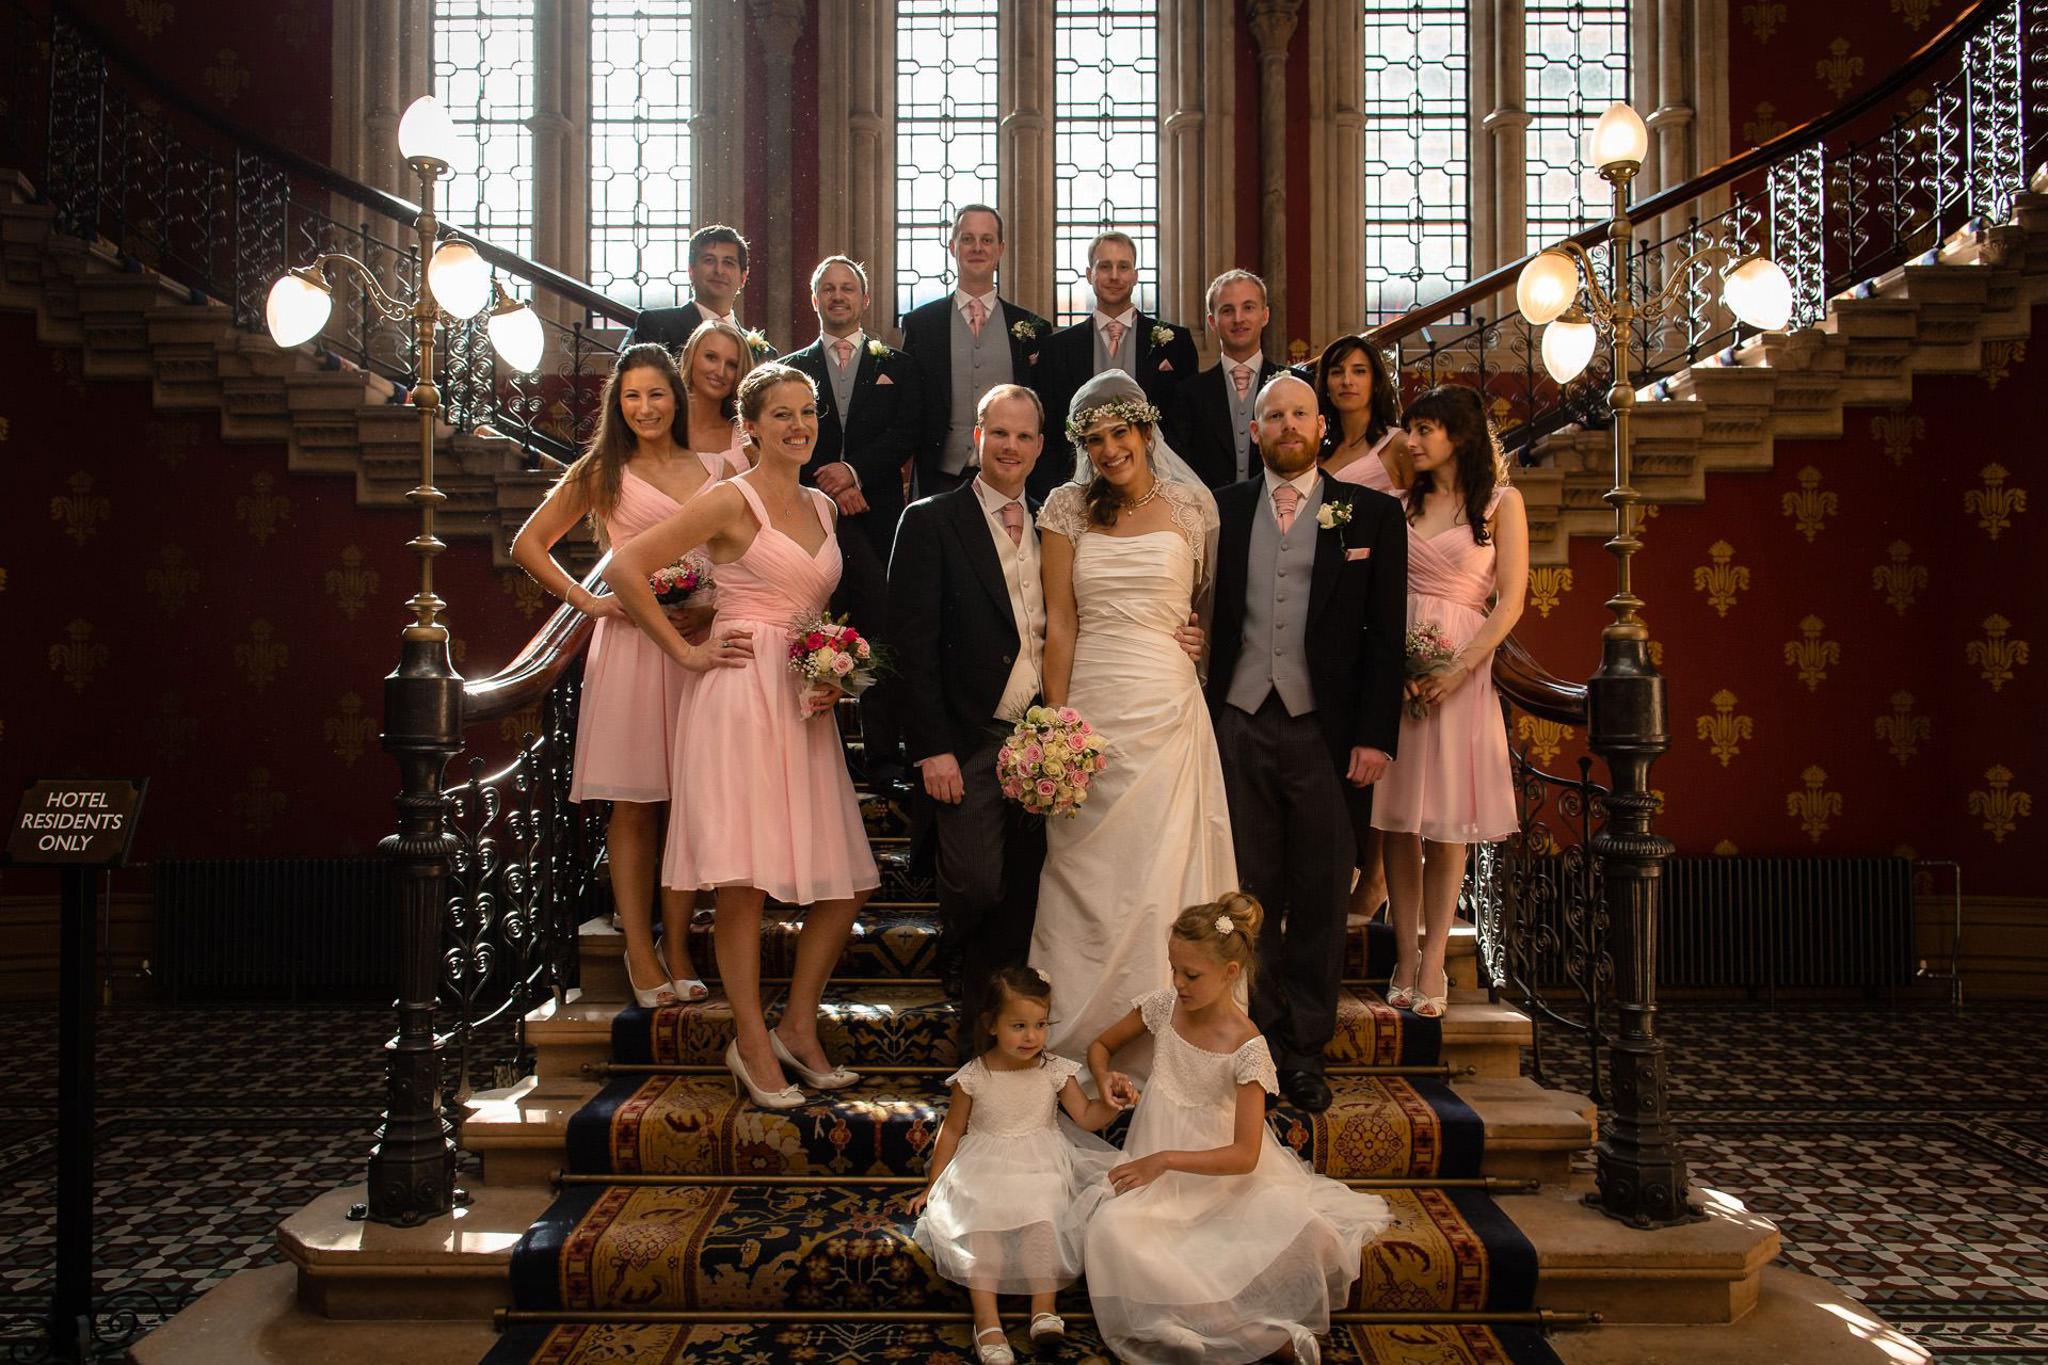 St. Pancras hotel wedding immediate family shot